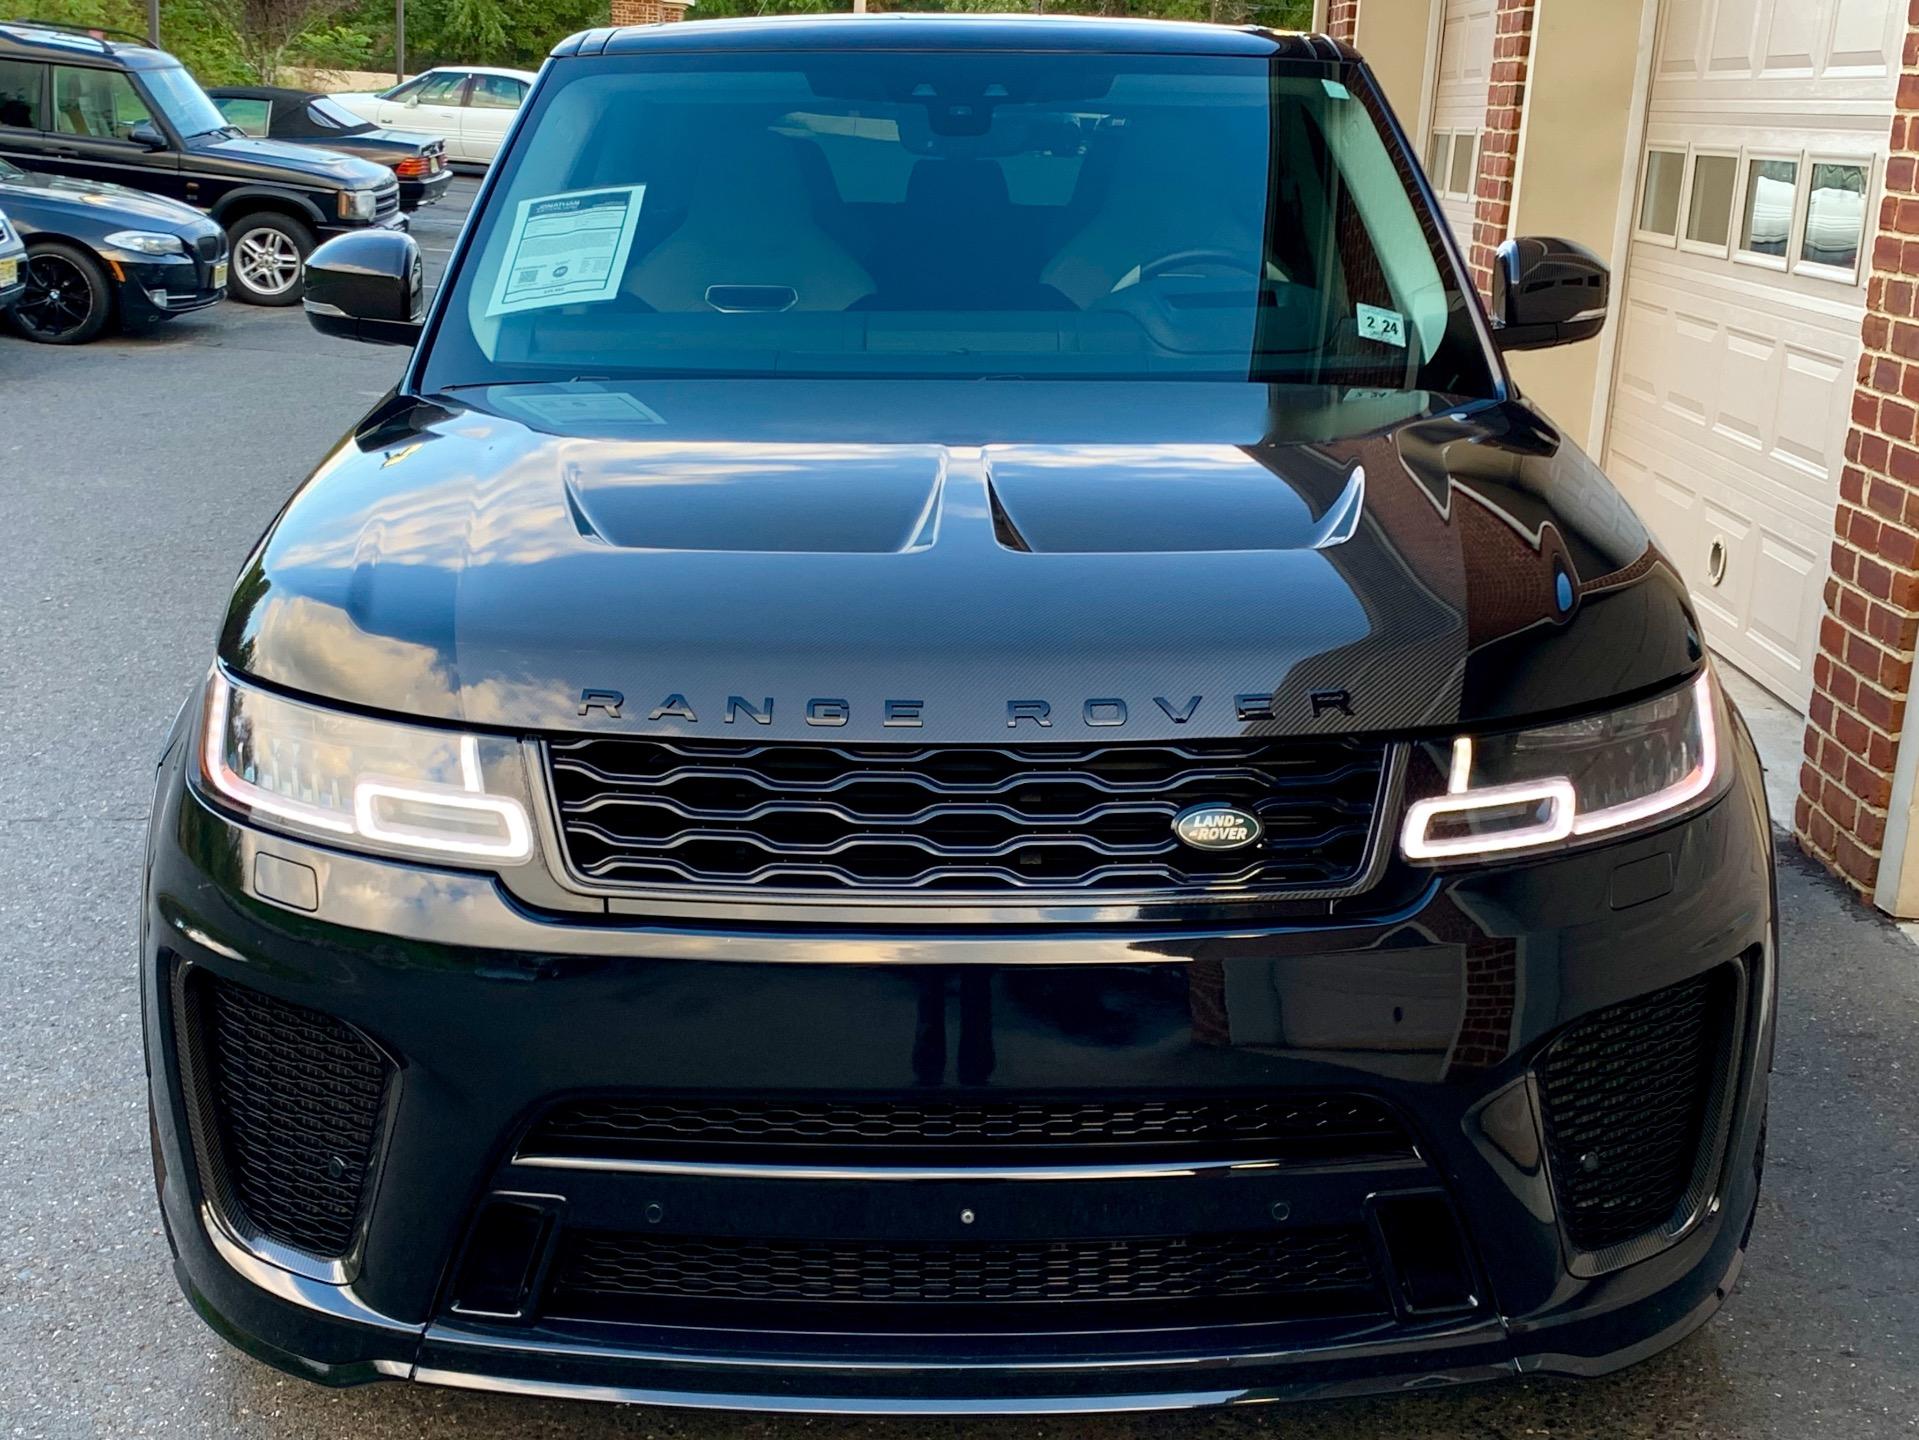 Used-2019-Land-Rover-Range-Rover-Sport-SVR